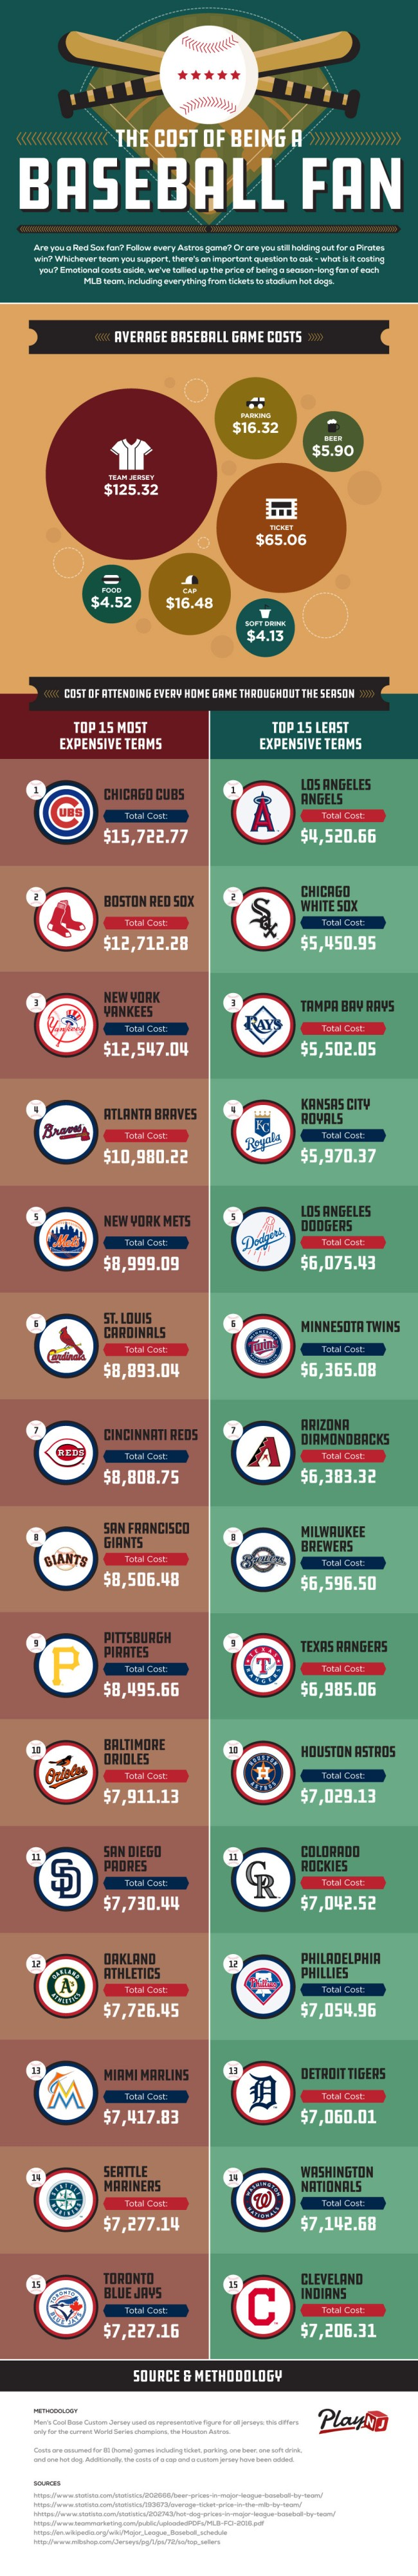 Average Cost Major League Baseball Fan